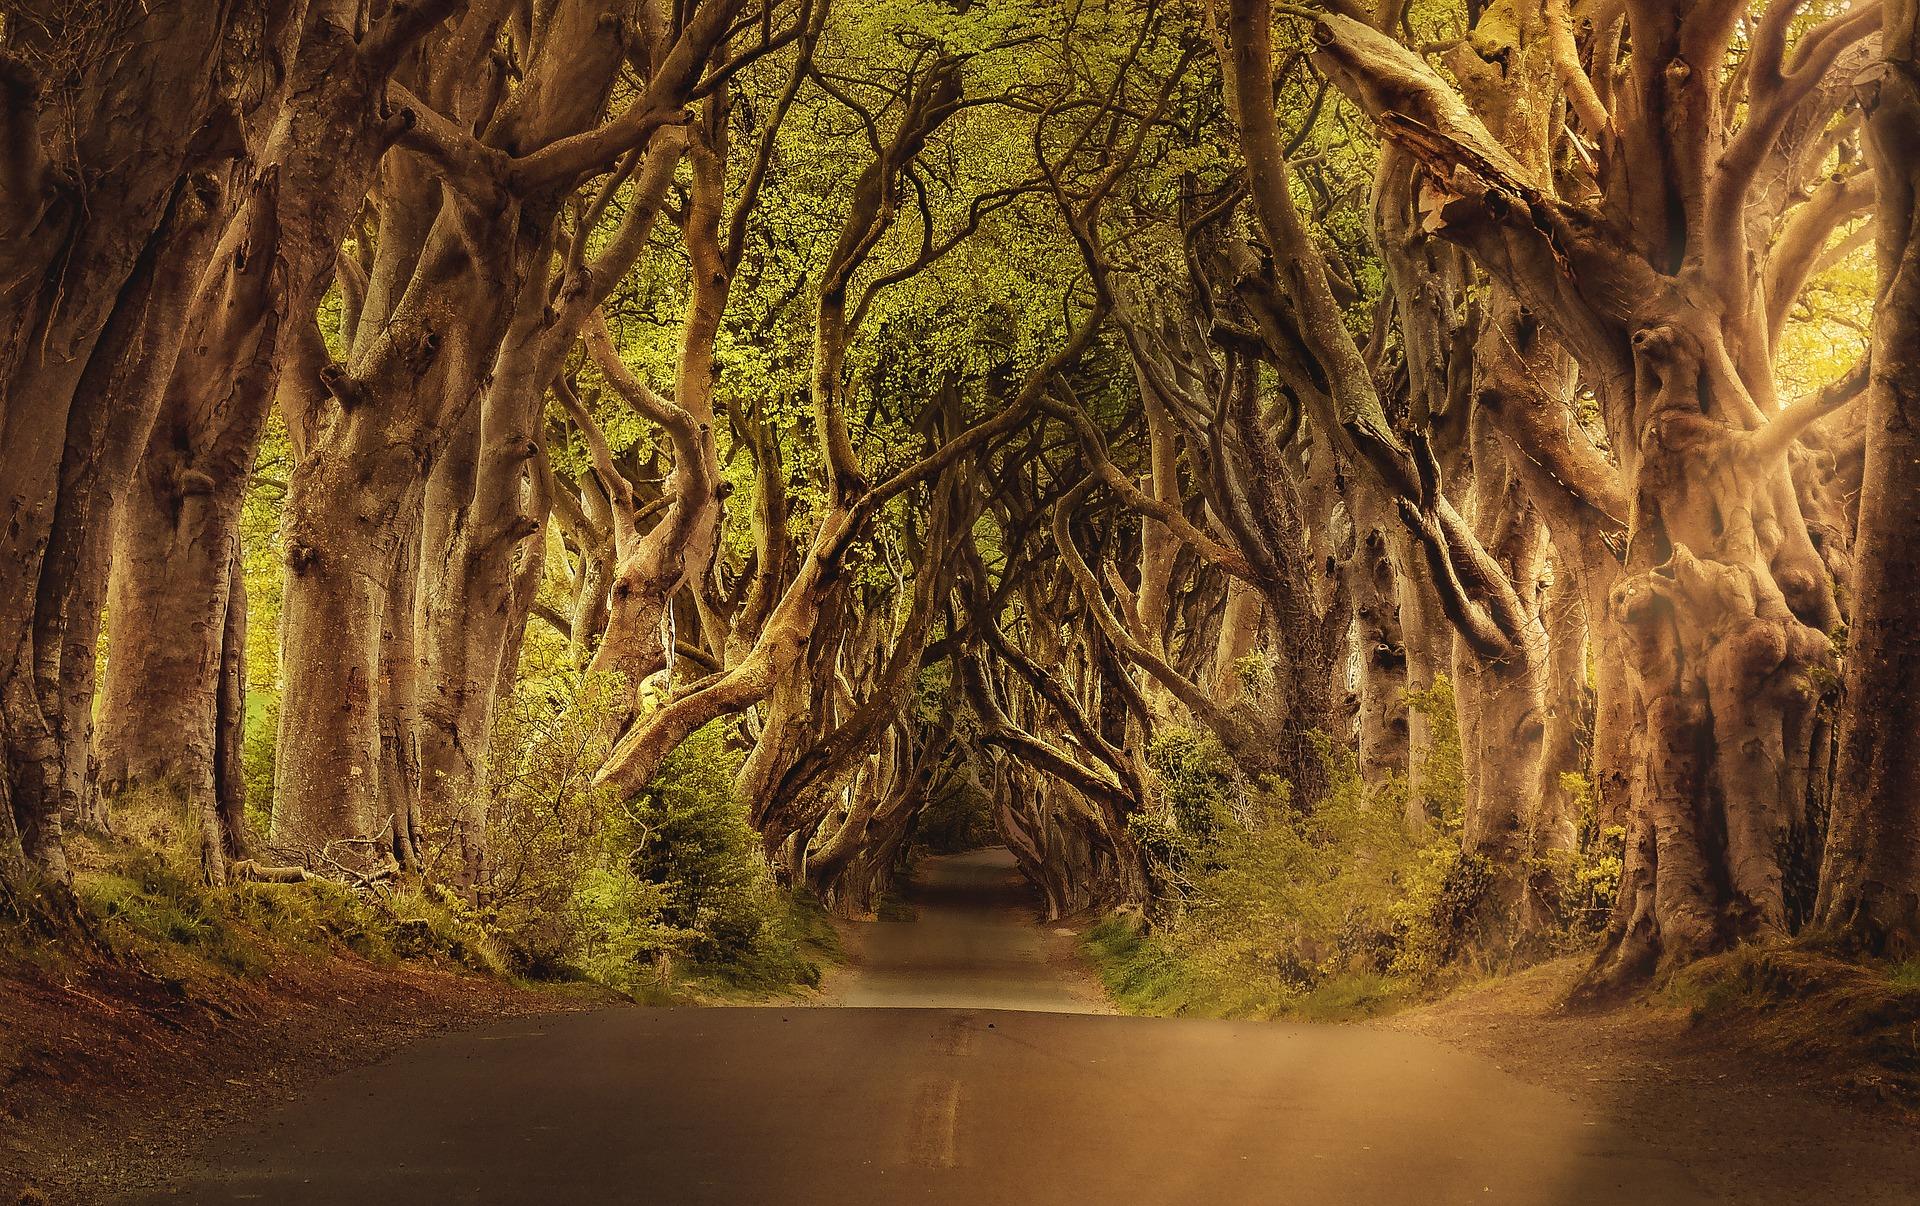 Igra prestola, serija, game of thrones, lokacije